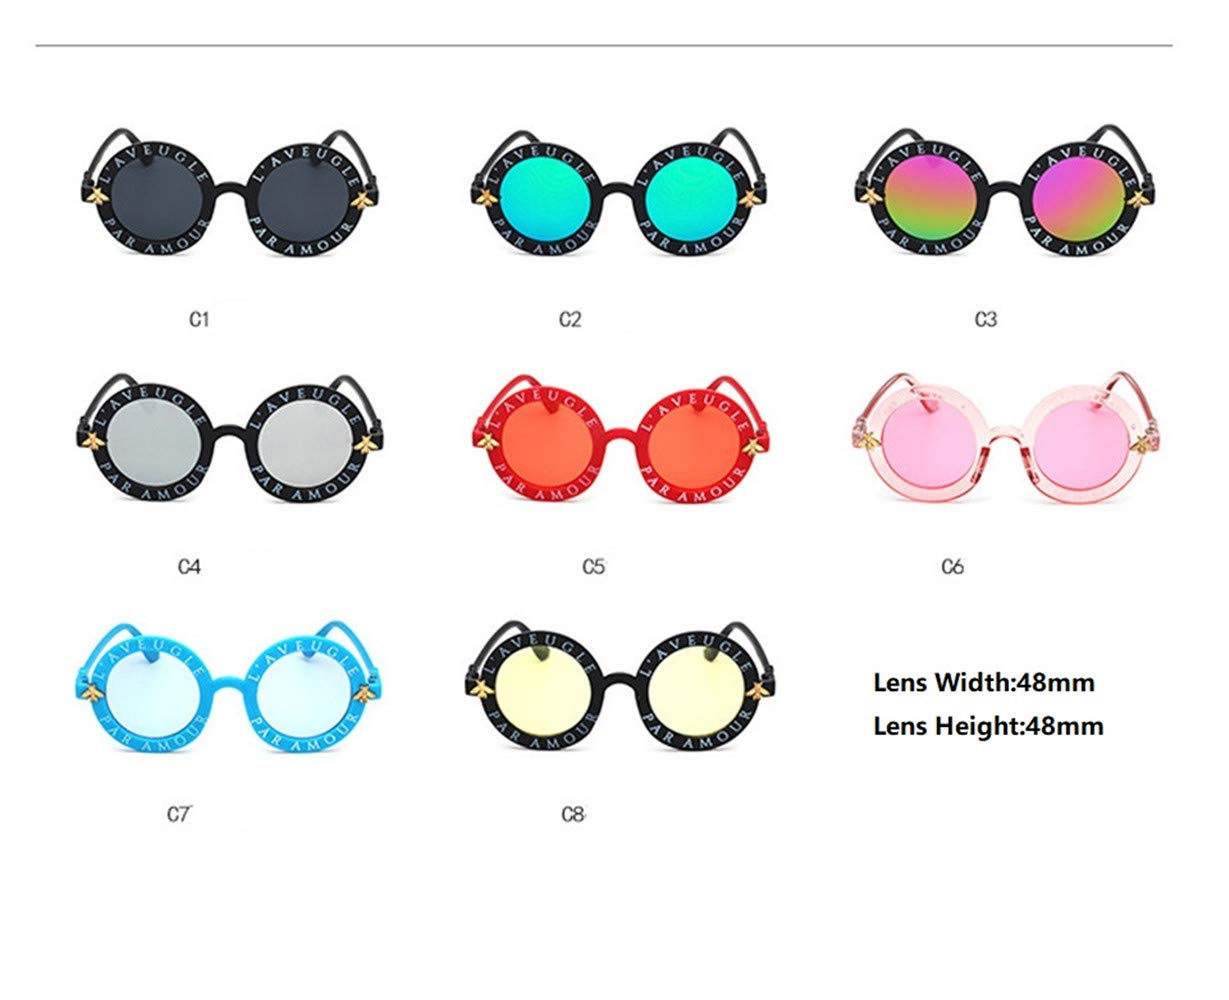 Wang-RX Steampunk Bee Kids Sunglasses Boys Girls Luxury Vintage Children Sunglasses Gafas redondas de sol 8 colores 2